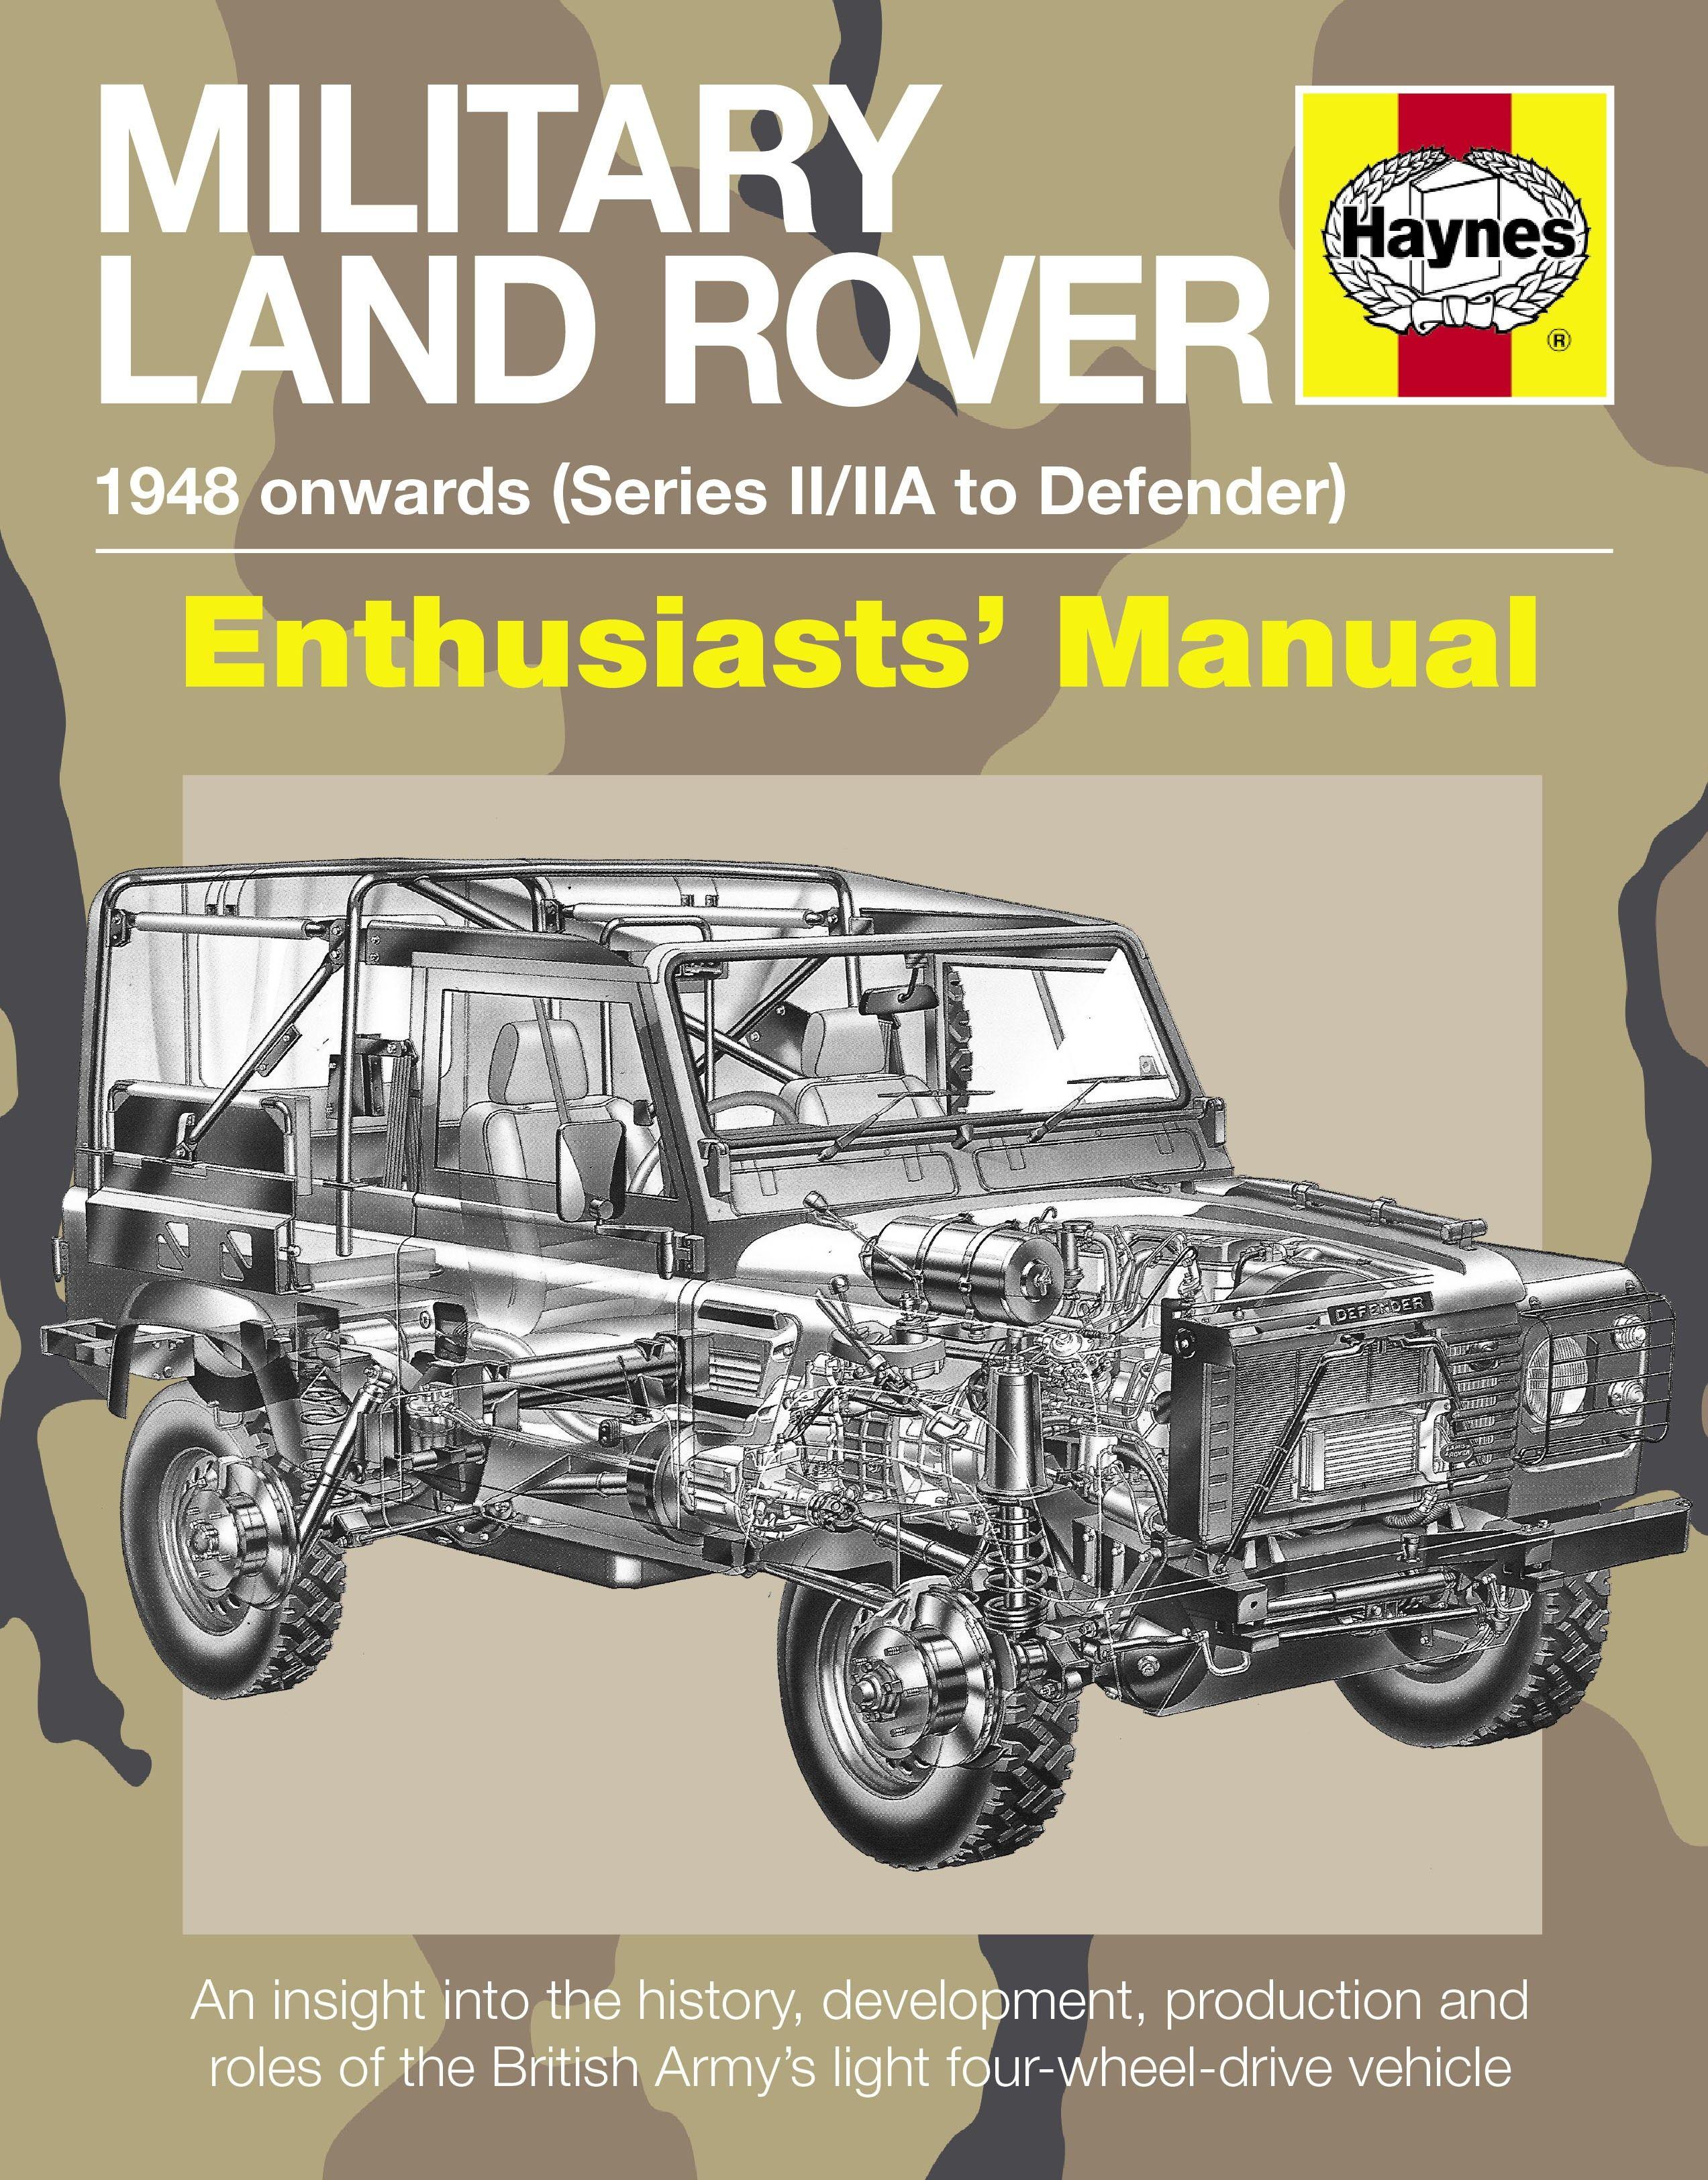 military land rover manual 1948 onwards (series ii/iia to defender